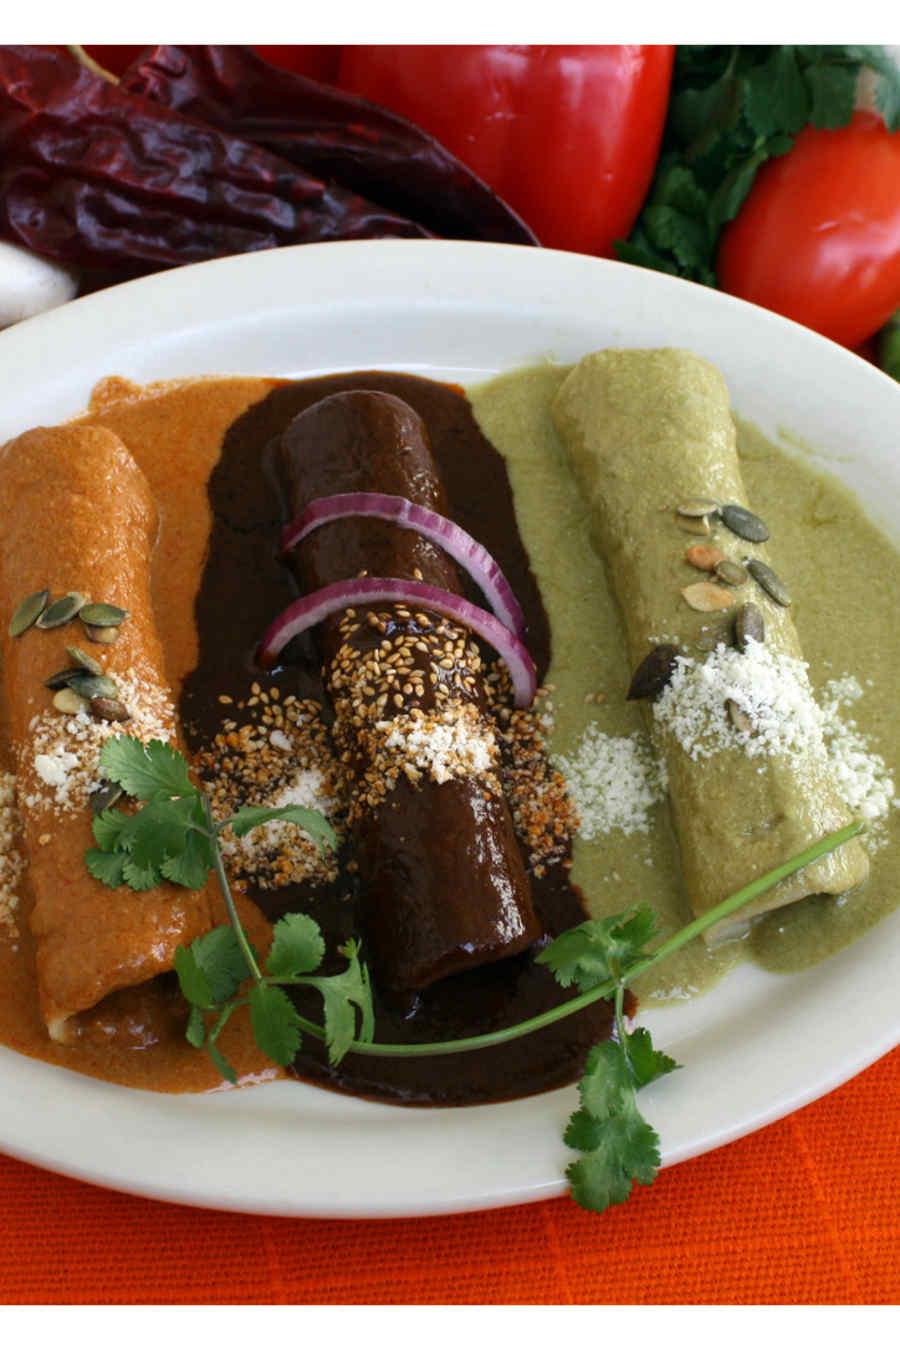 Three moles enchiladas smothered in mole poblano